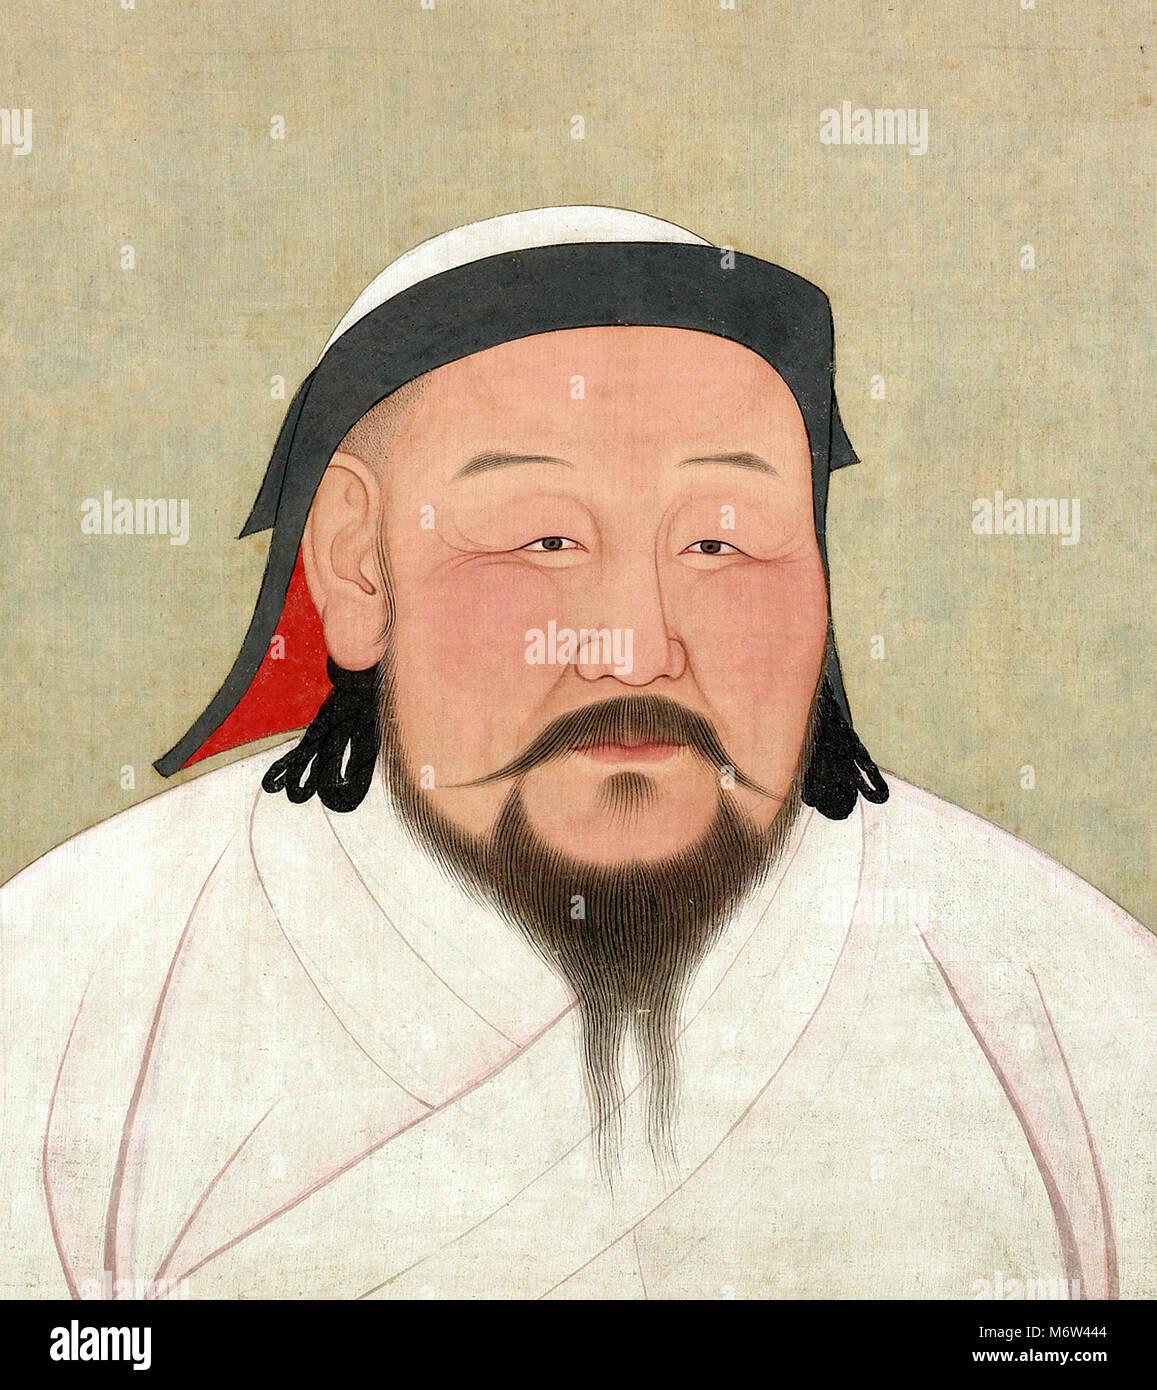 Kublai Khan (1215-1294), Porträt des Fünften scheiterten (Great Khan) des Mongolischen Reiches, Farbe Stockbild